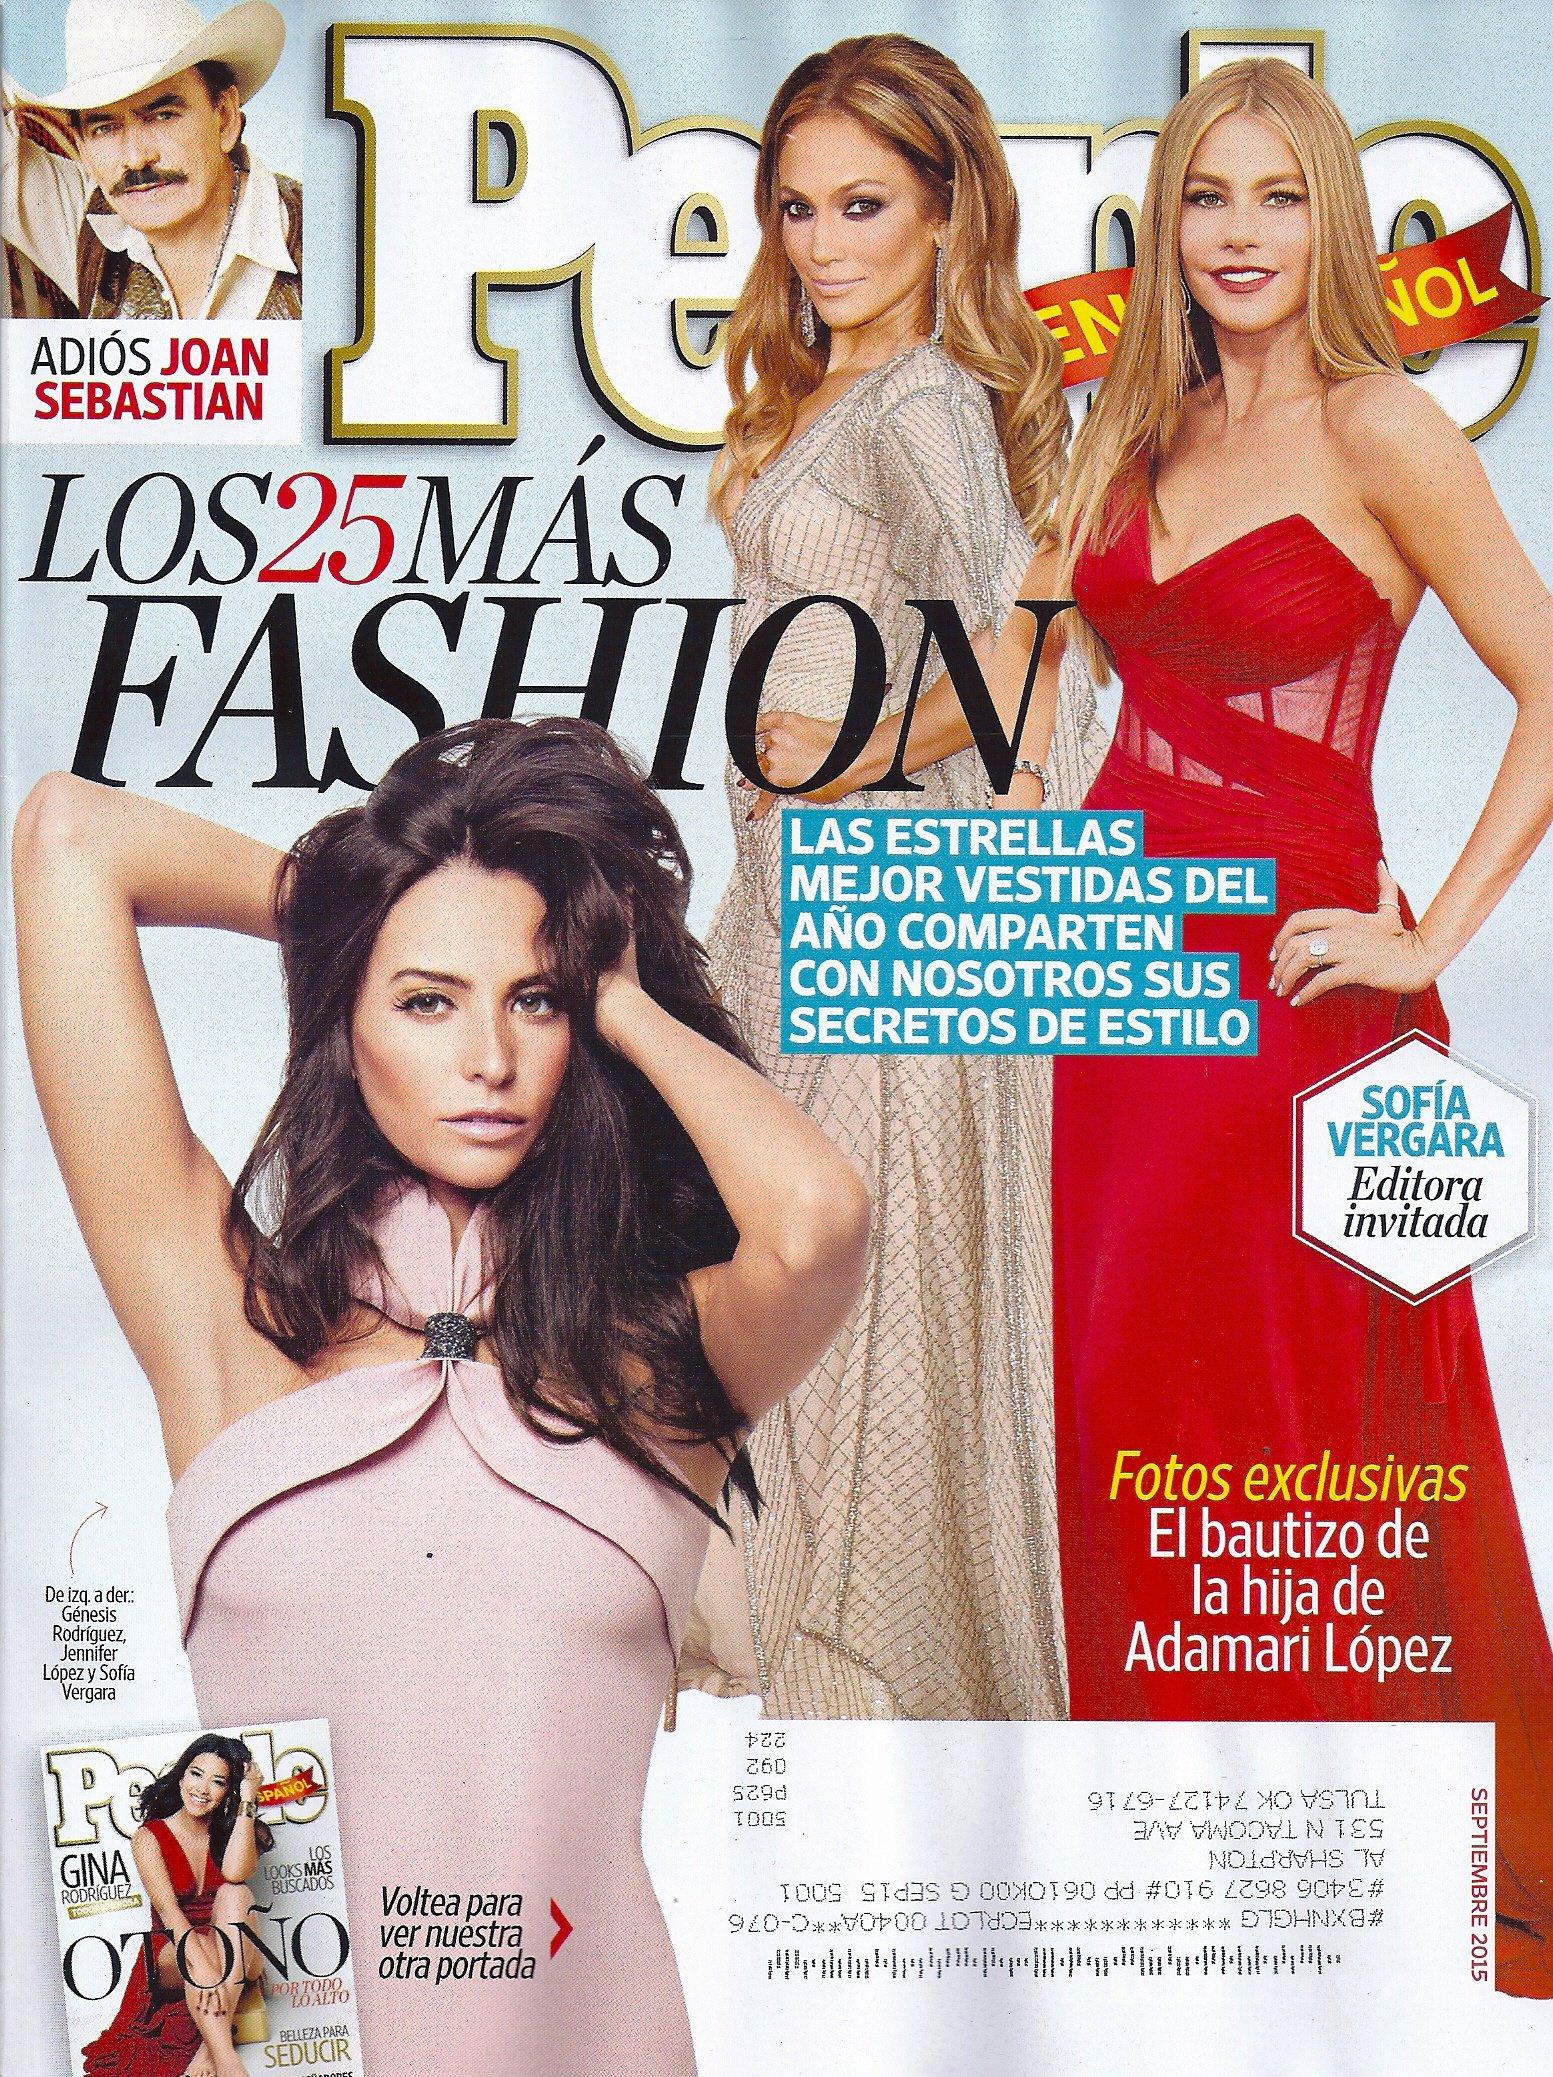 LOS 25 MAS FASHION l Genesis Rodriguez l Jennifer Lopez l Sofia Vergara l Gina Rodriguez l Joan Sebastian l Cristiano Ronaldo - Septiembre/September, ...